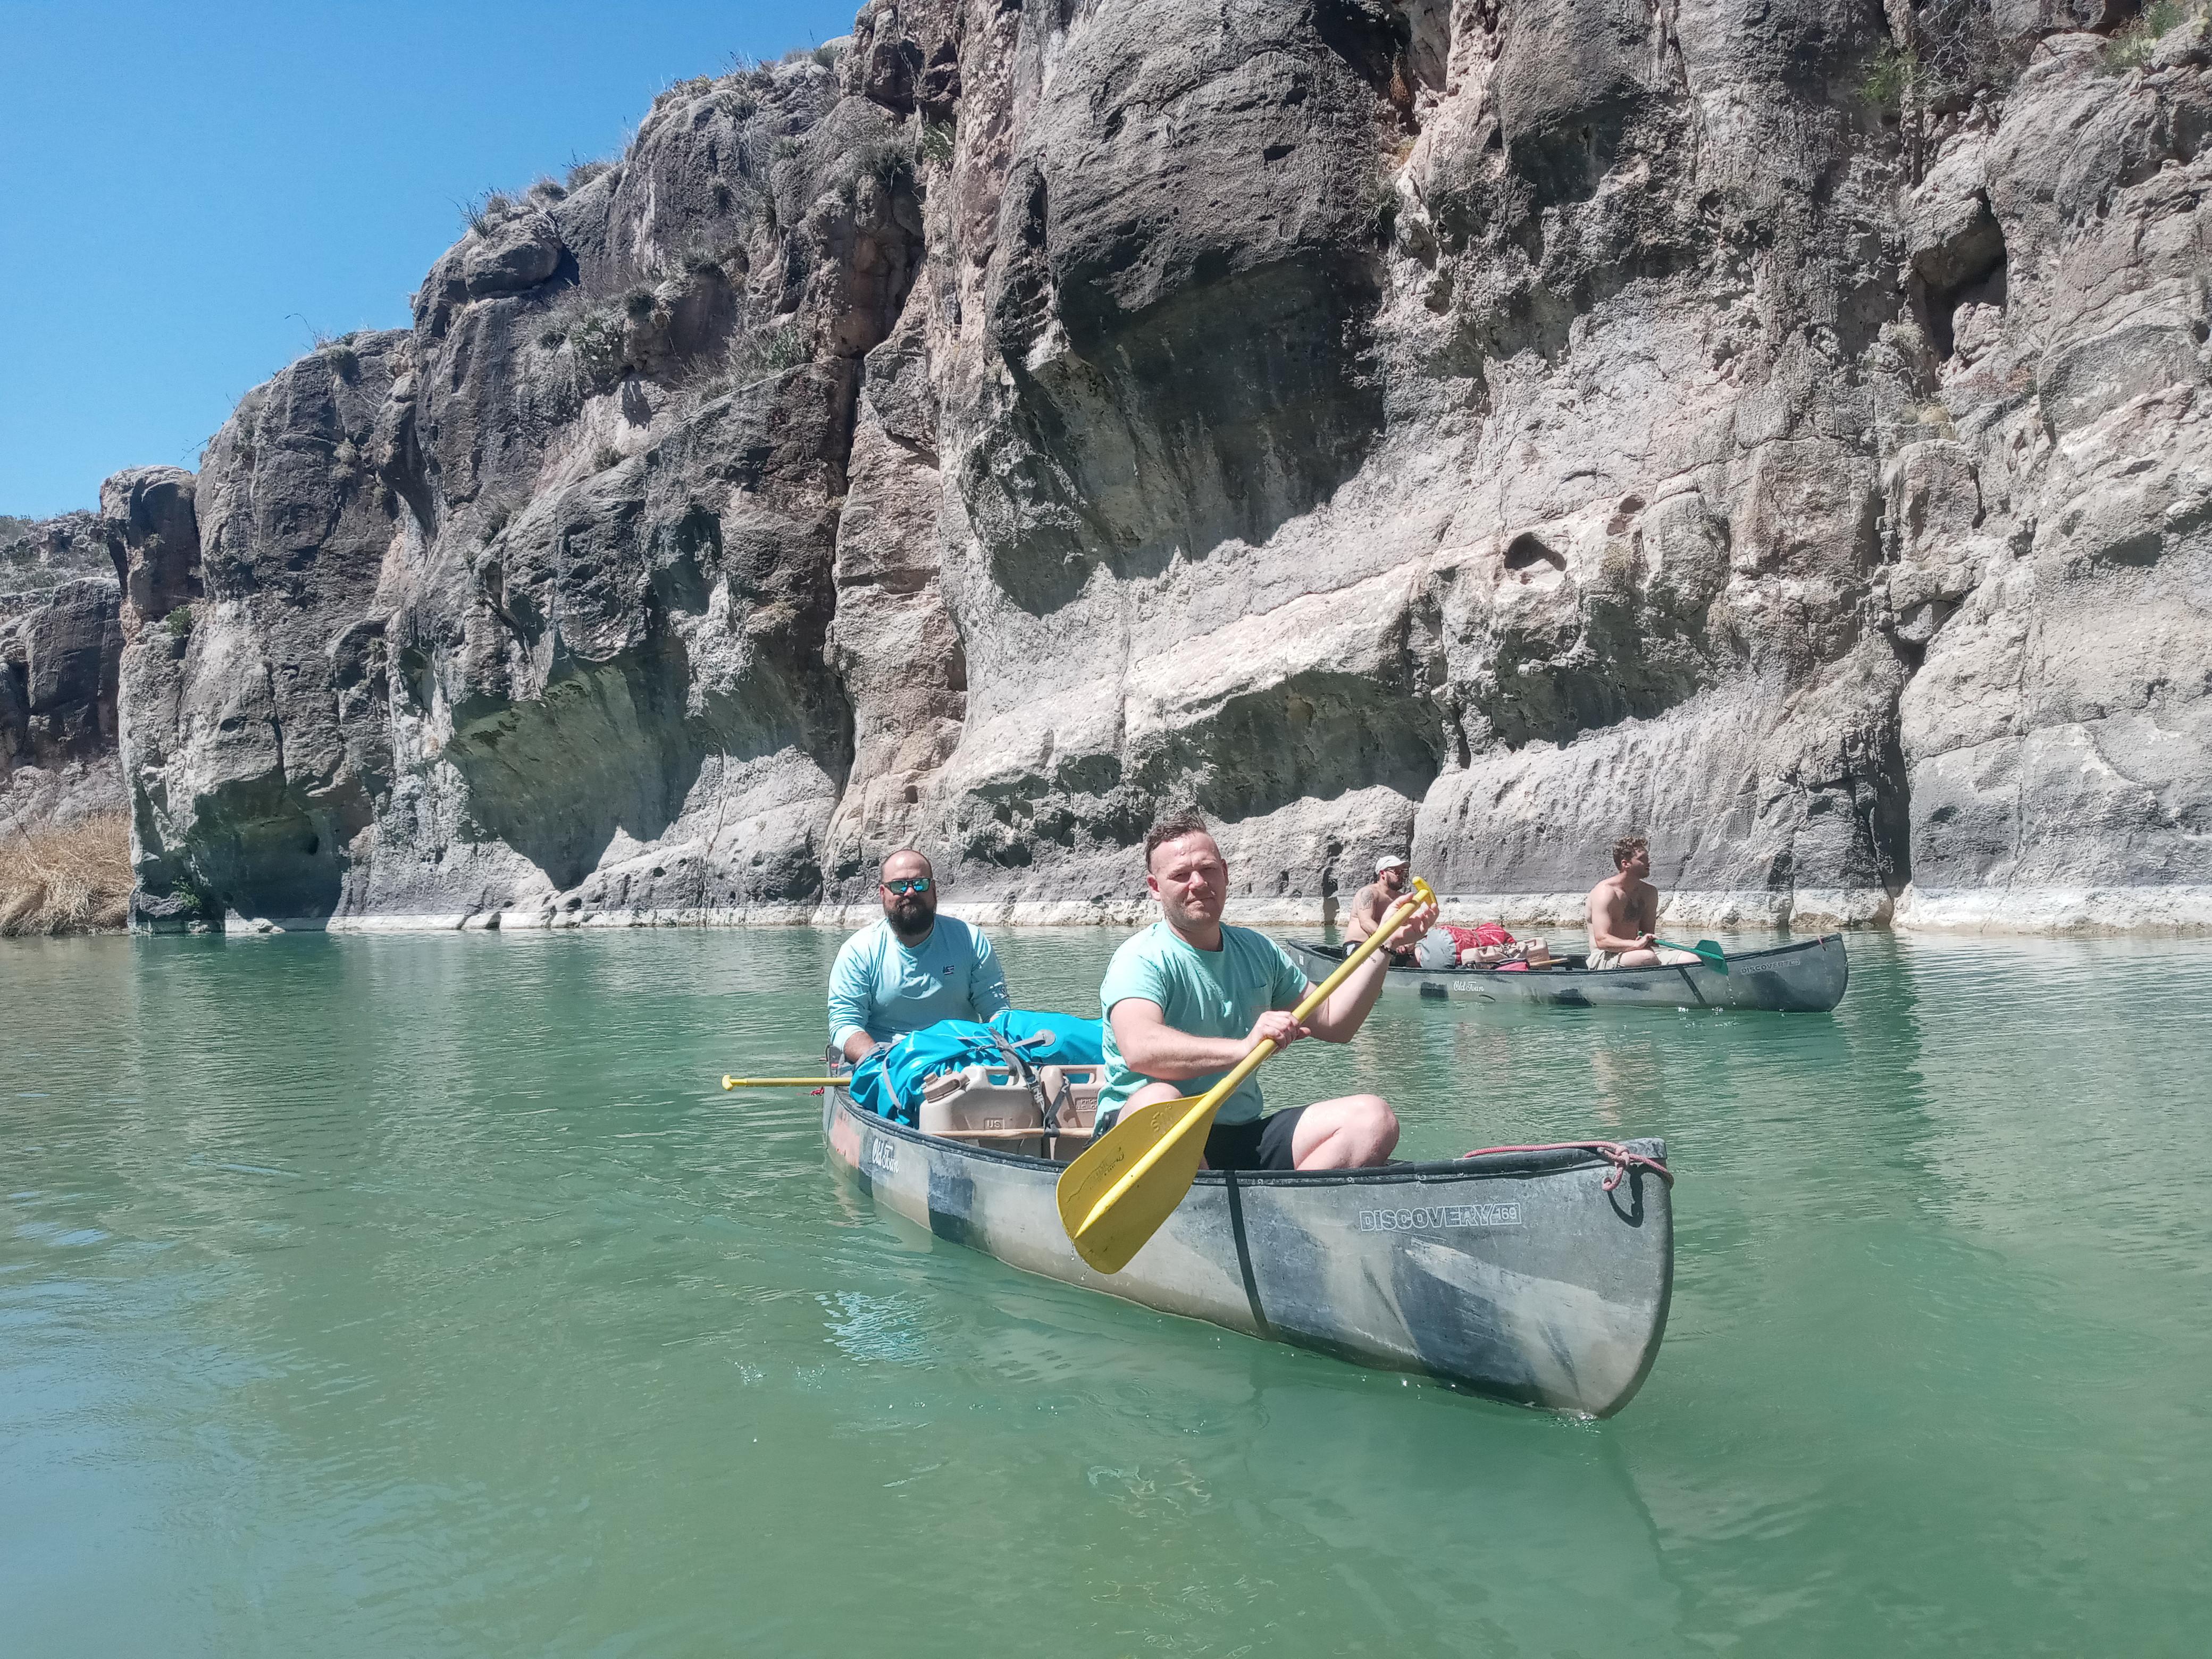 4 Day Boquillas Canyon River Trip